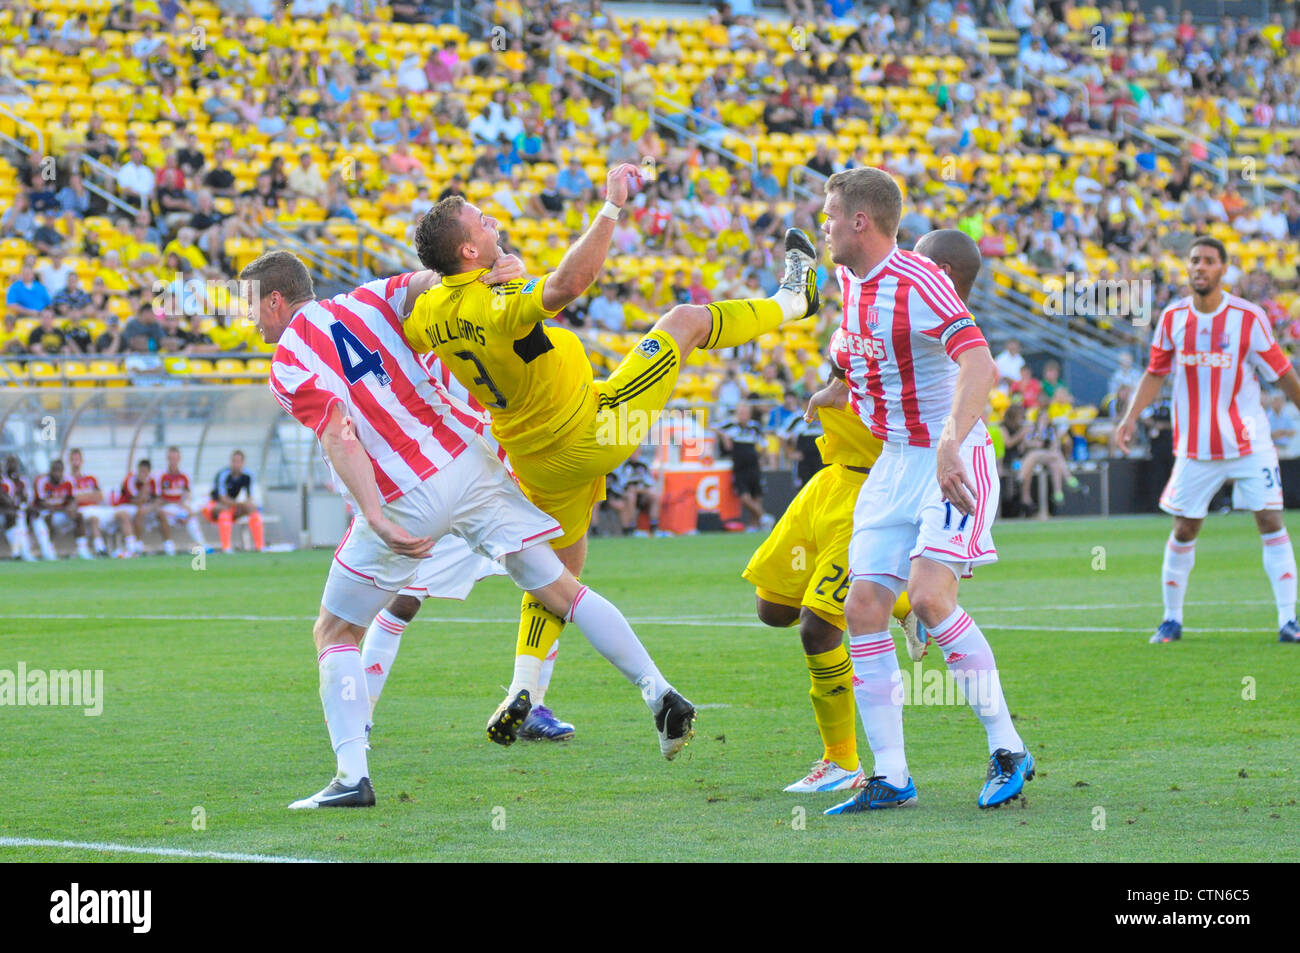 Columbus Crew host Stoke City FC for an international friendly game at Columbus' Crew Stadium, Columbus, Ohio - Stock Image